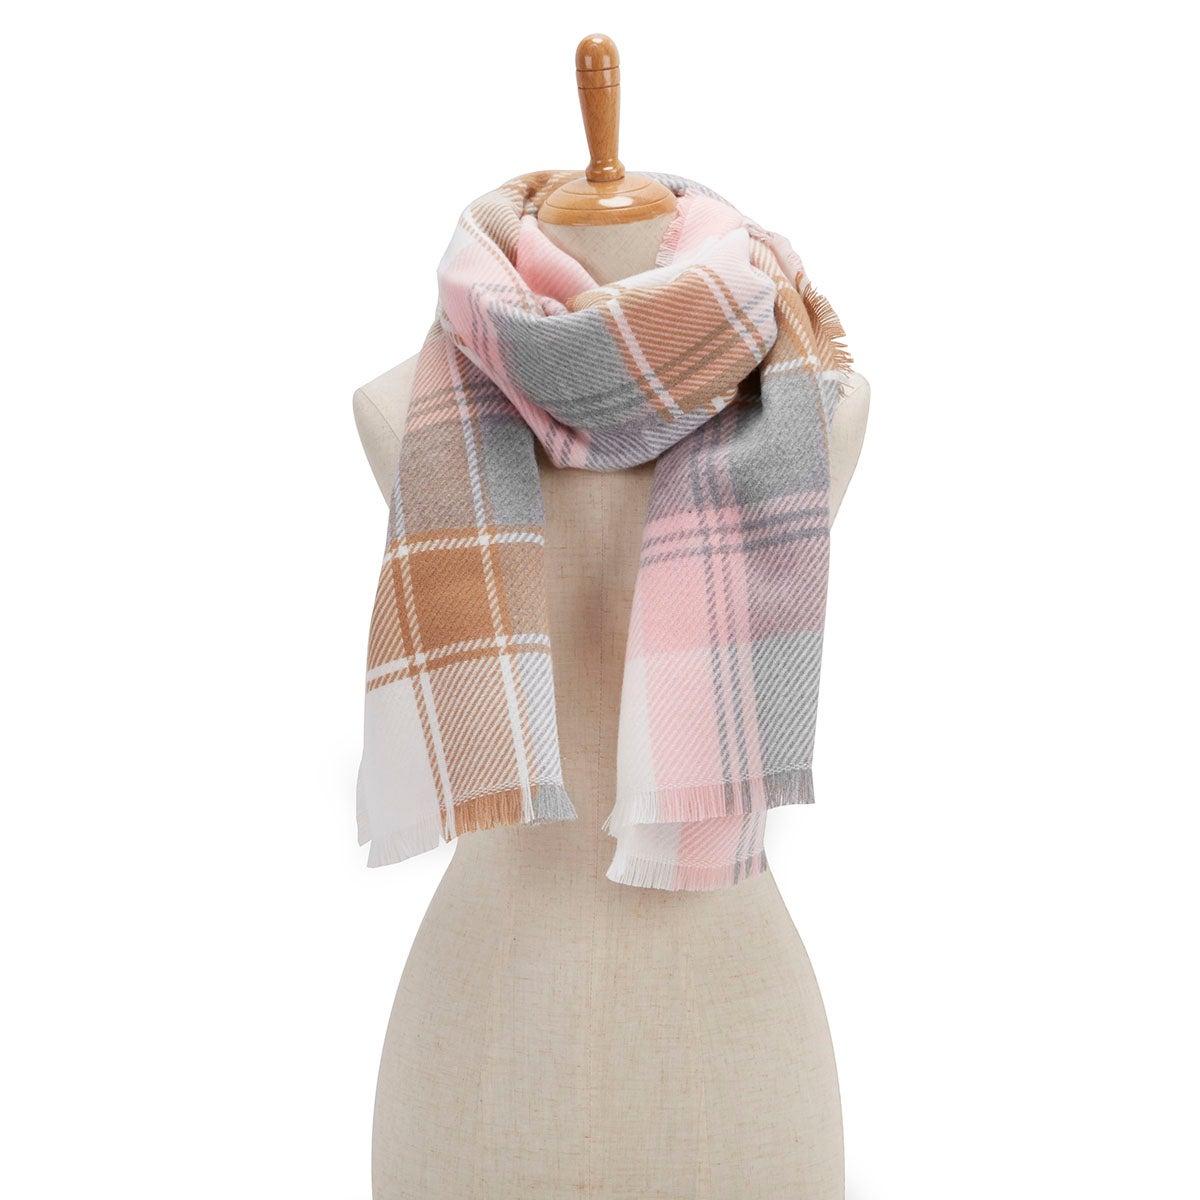 Lds Plaid Wrap camel/rose scarf